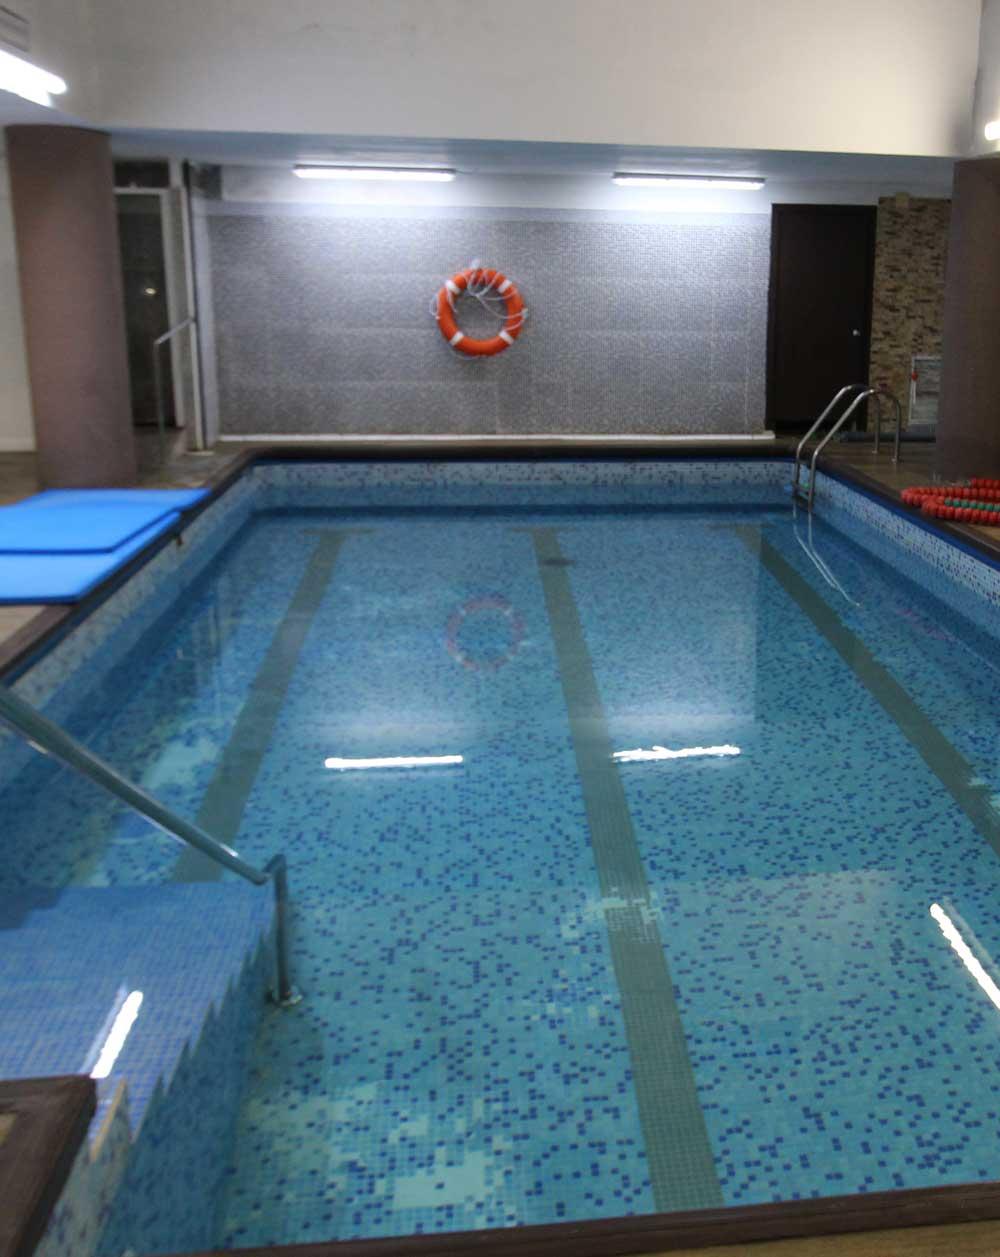 colegio-mayor-universsitario-zaragoza-piscina-2